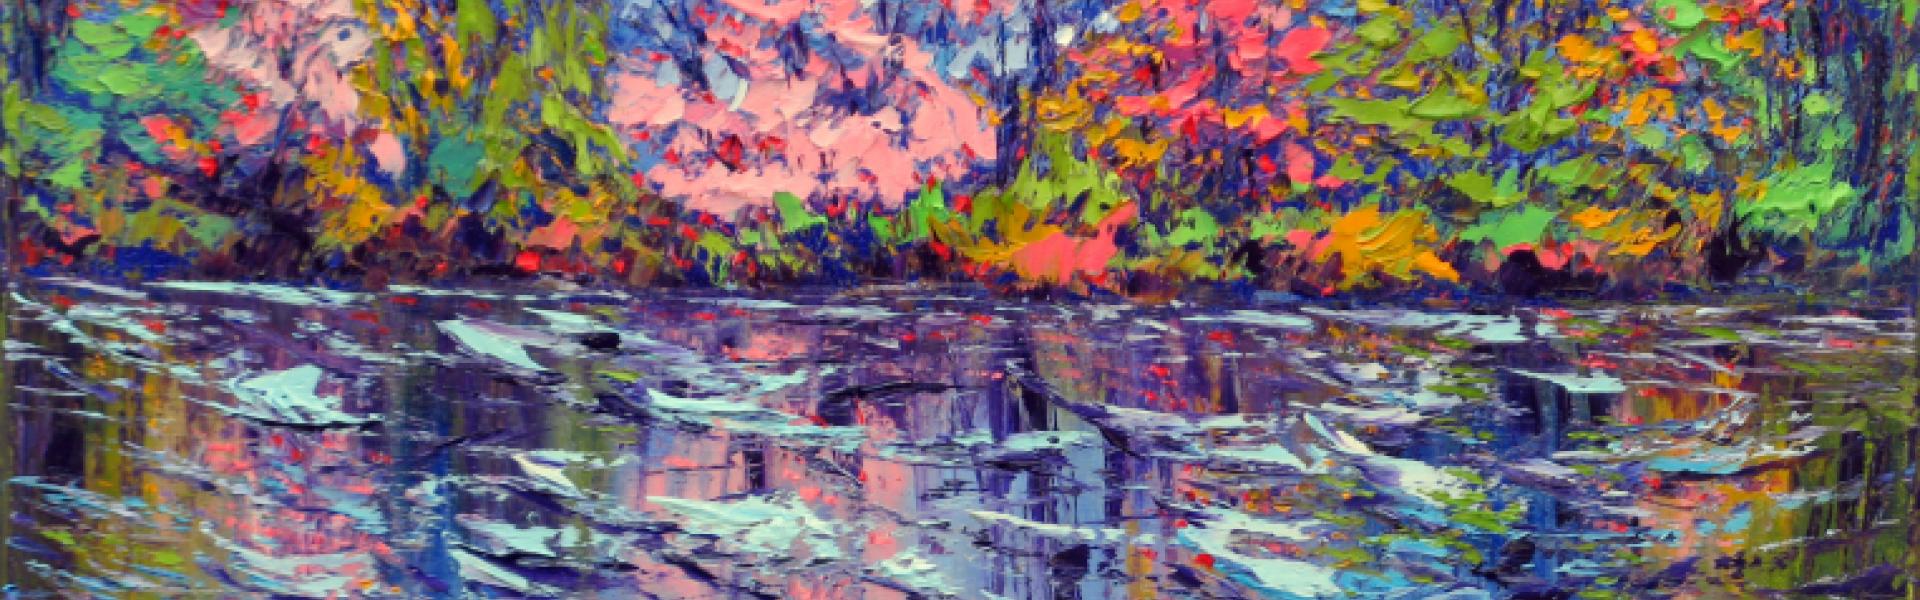 banner_Blooms-of-Autumn-Ottawa-River-16x20in.20210520111045.jpg